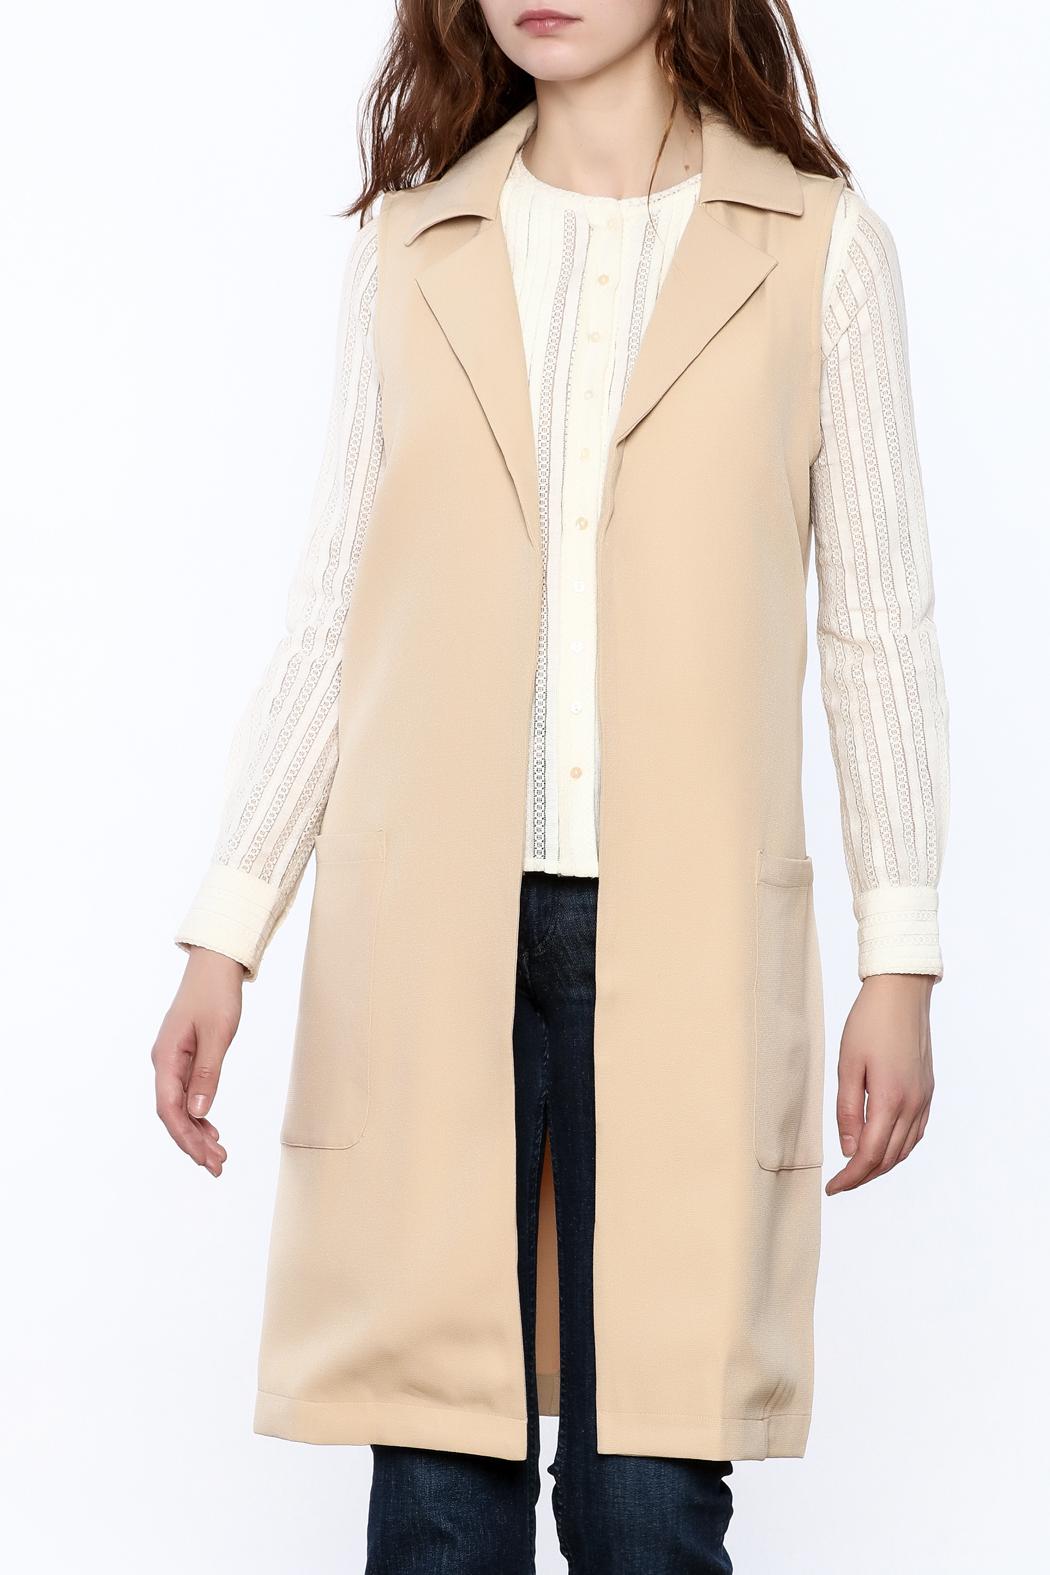 Sleeveless Trench Coat Dress | Burgundy Trench Coat Womens | Sleeveless Trench Coat